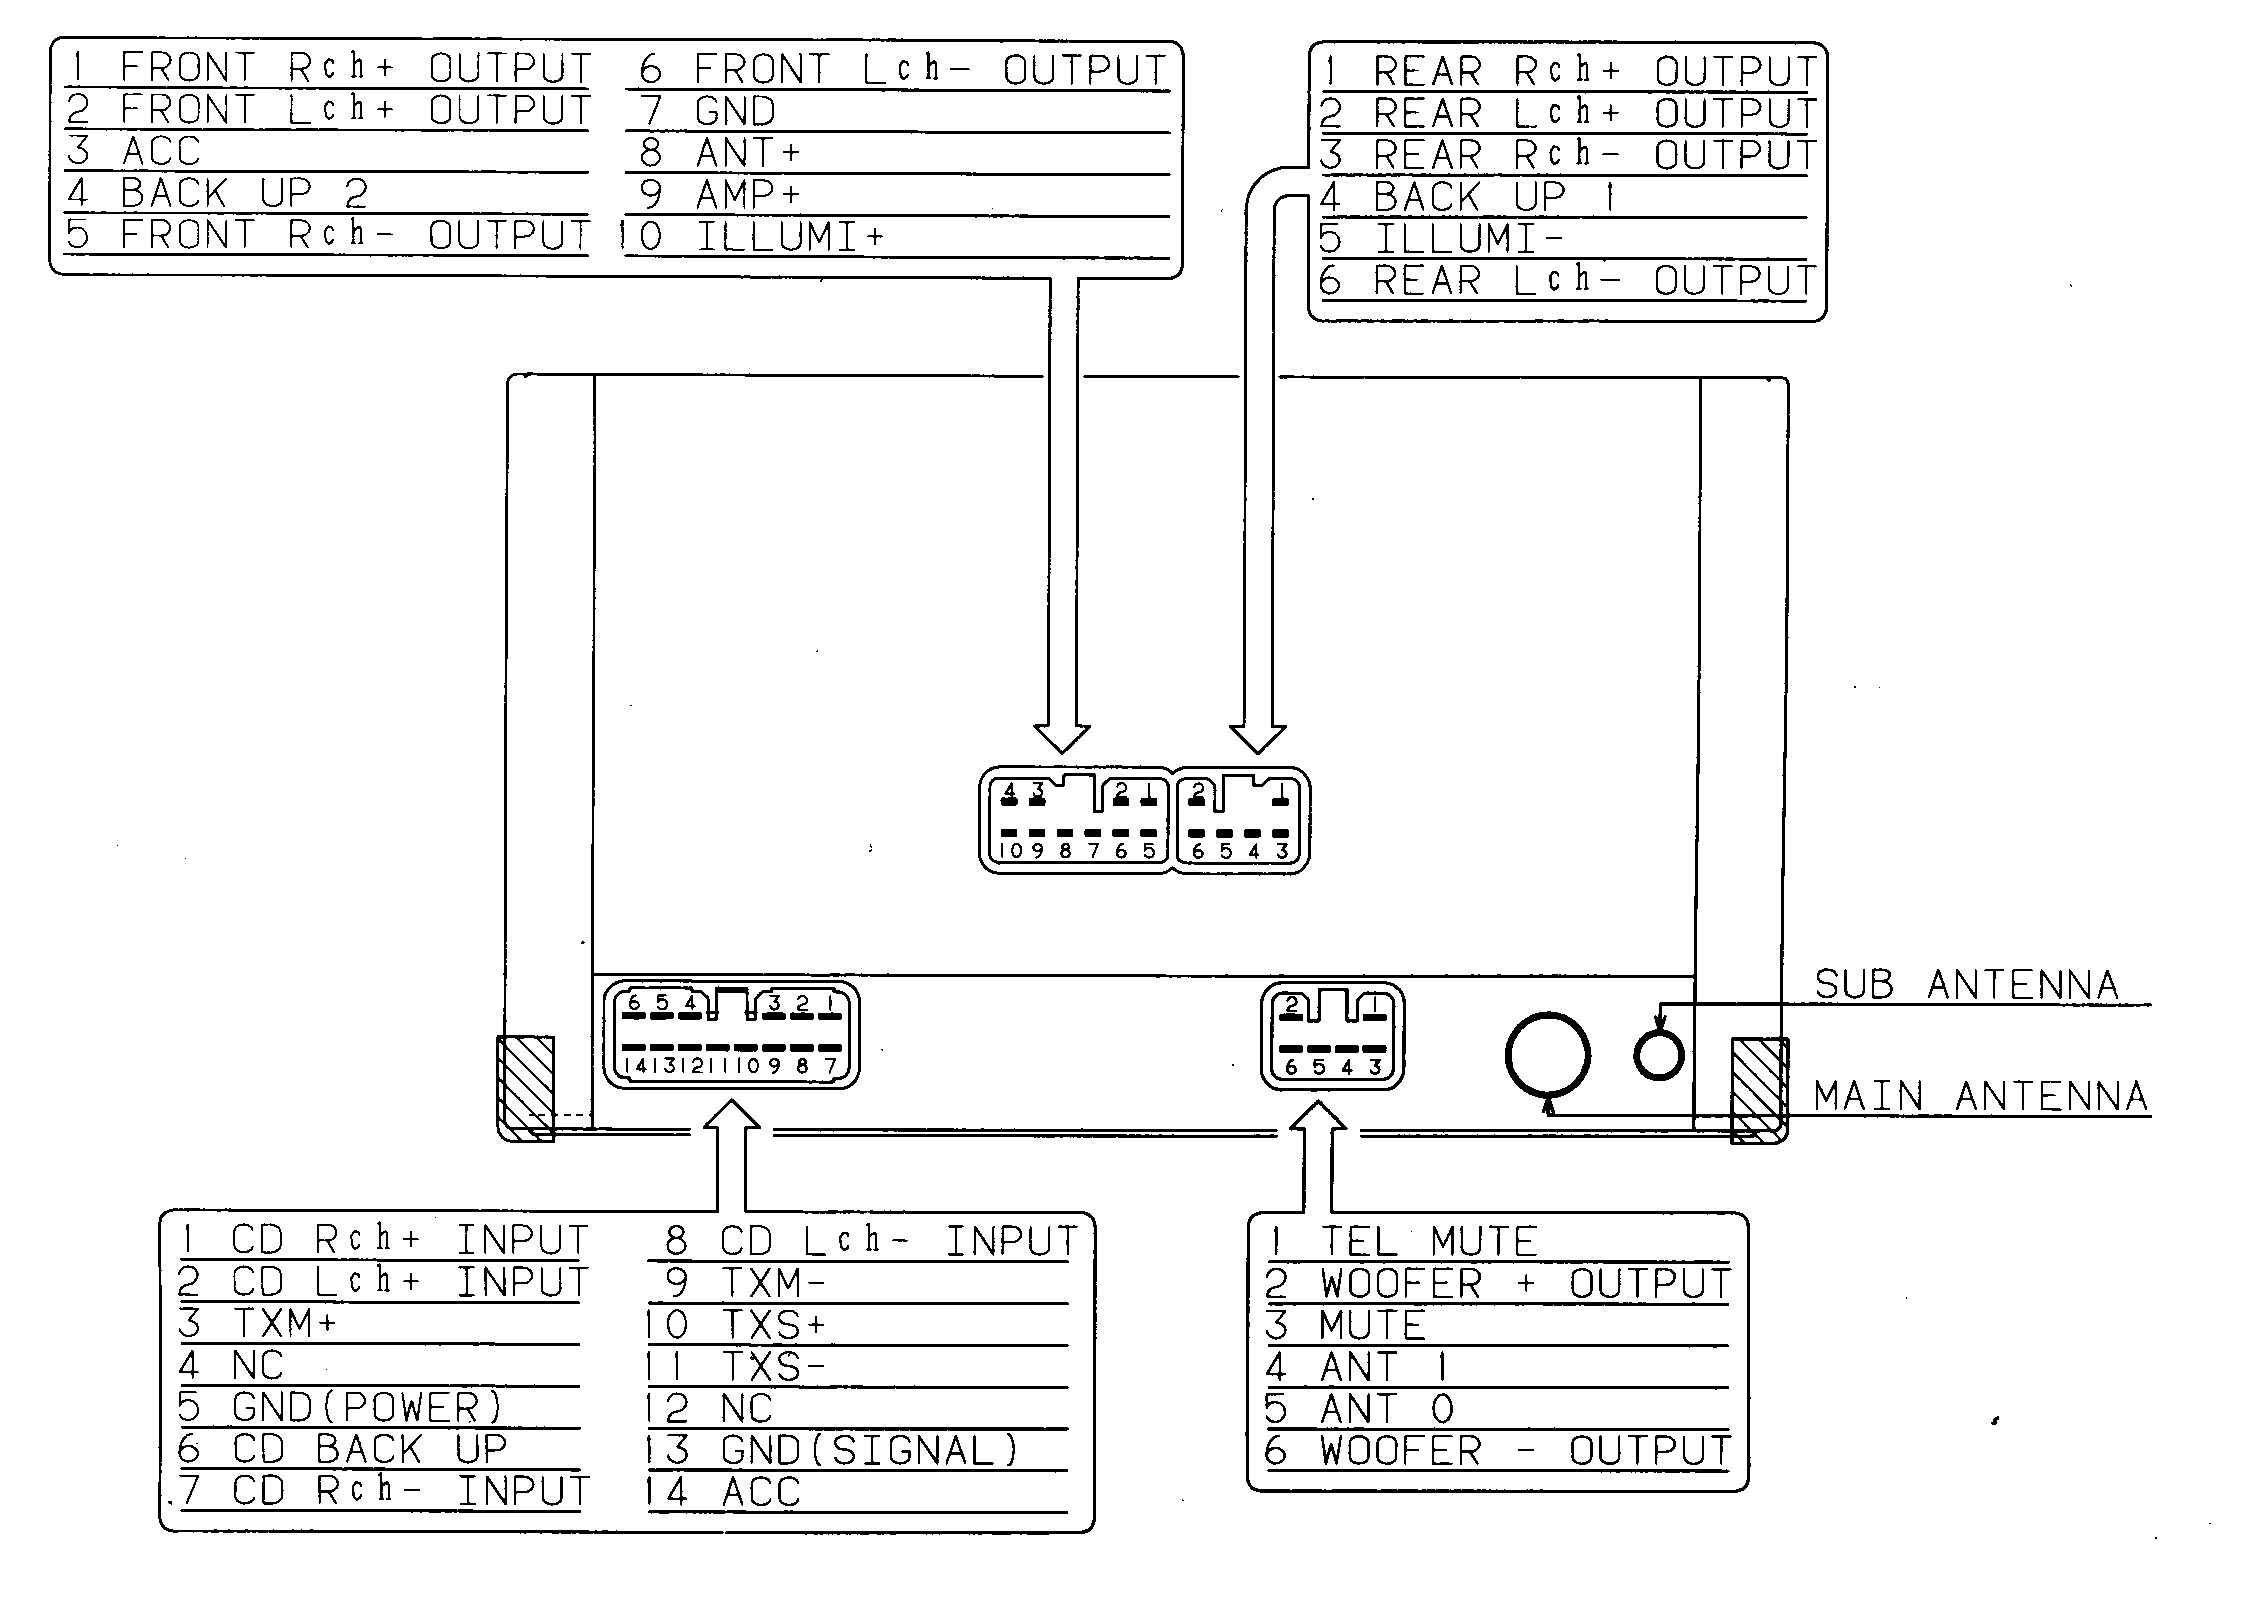 hight resolution of lexus lx470 headlight wiring harness wiring diagram expert lexus lx470 headlight wiring harness